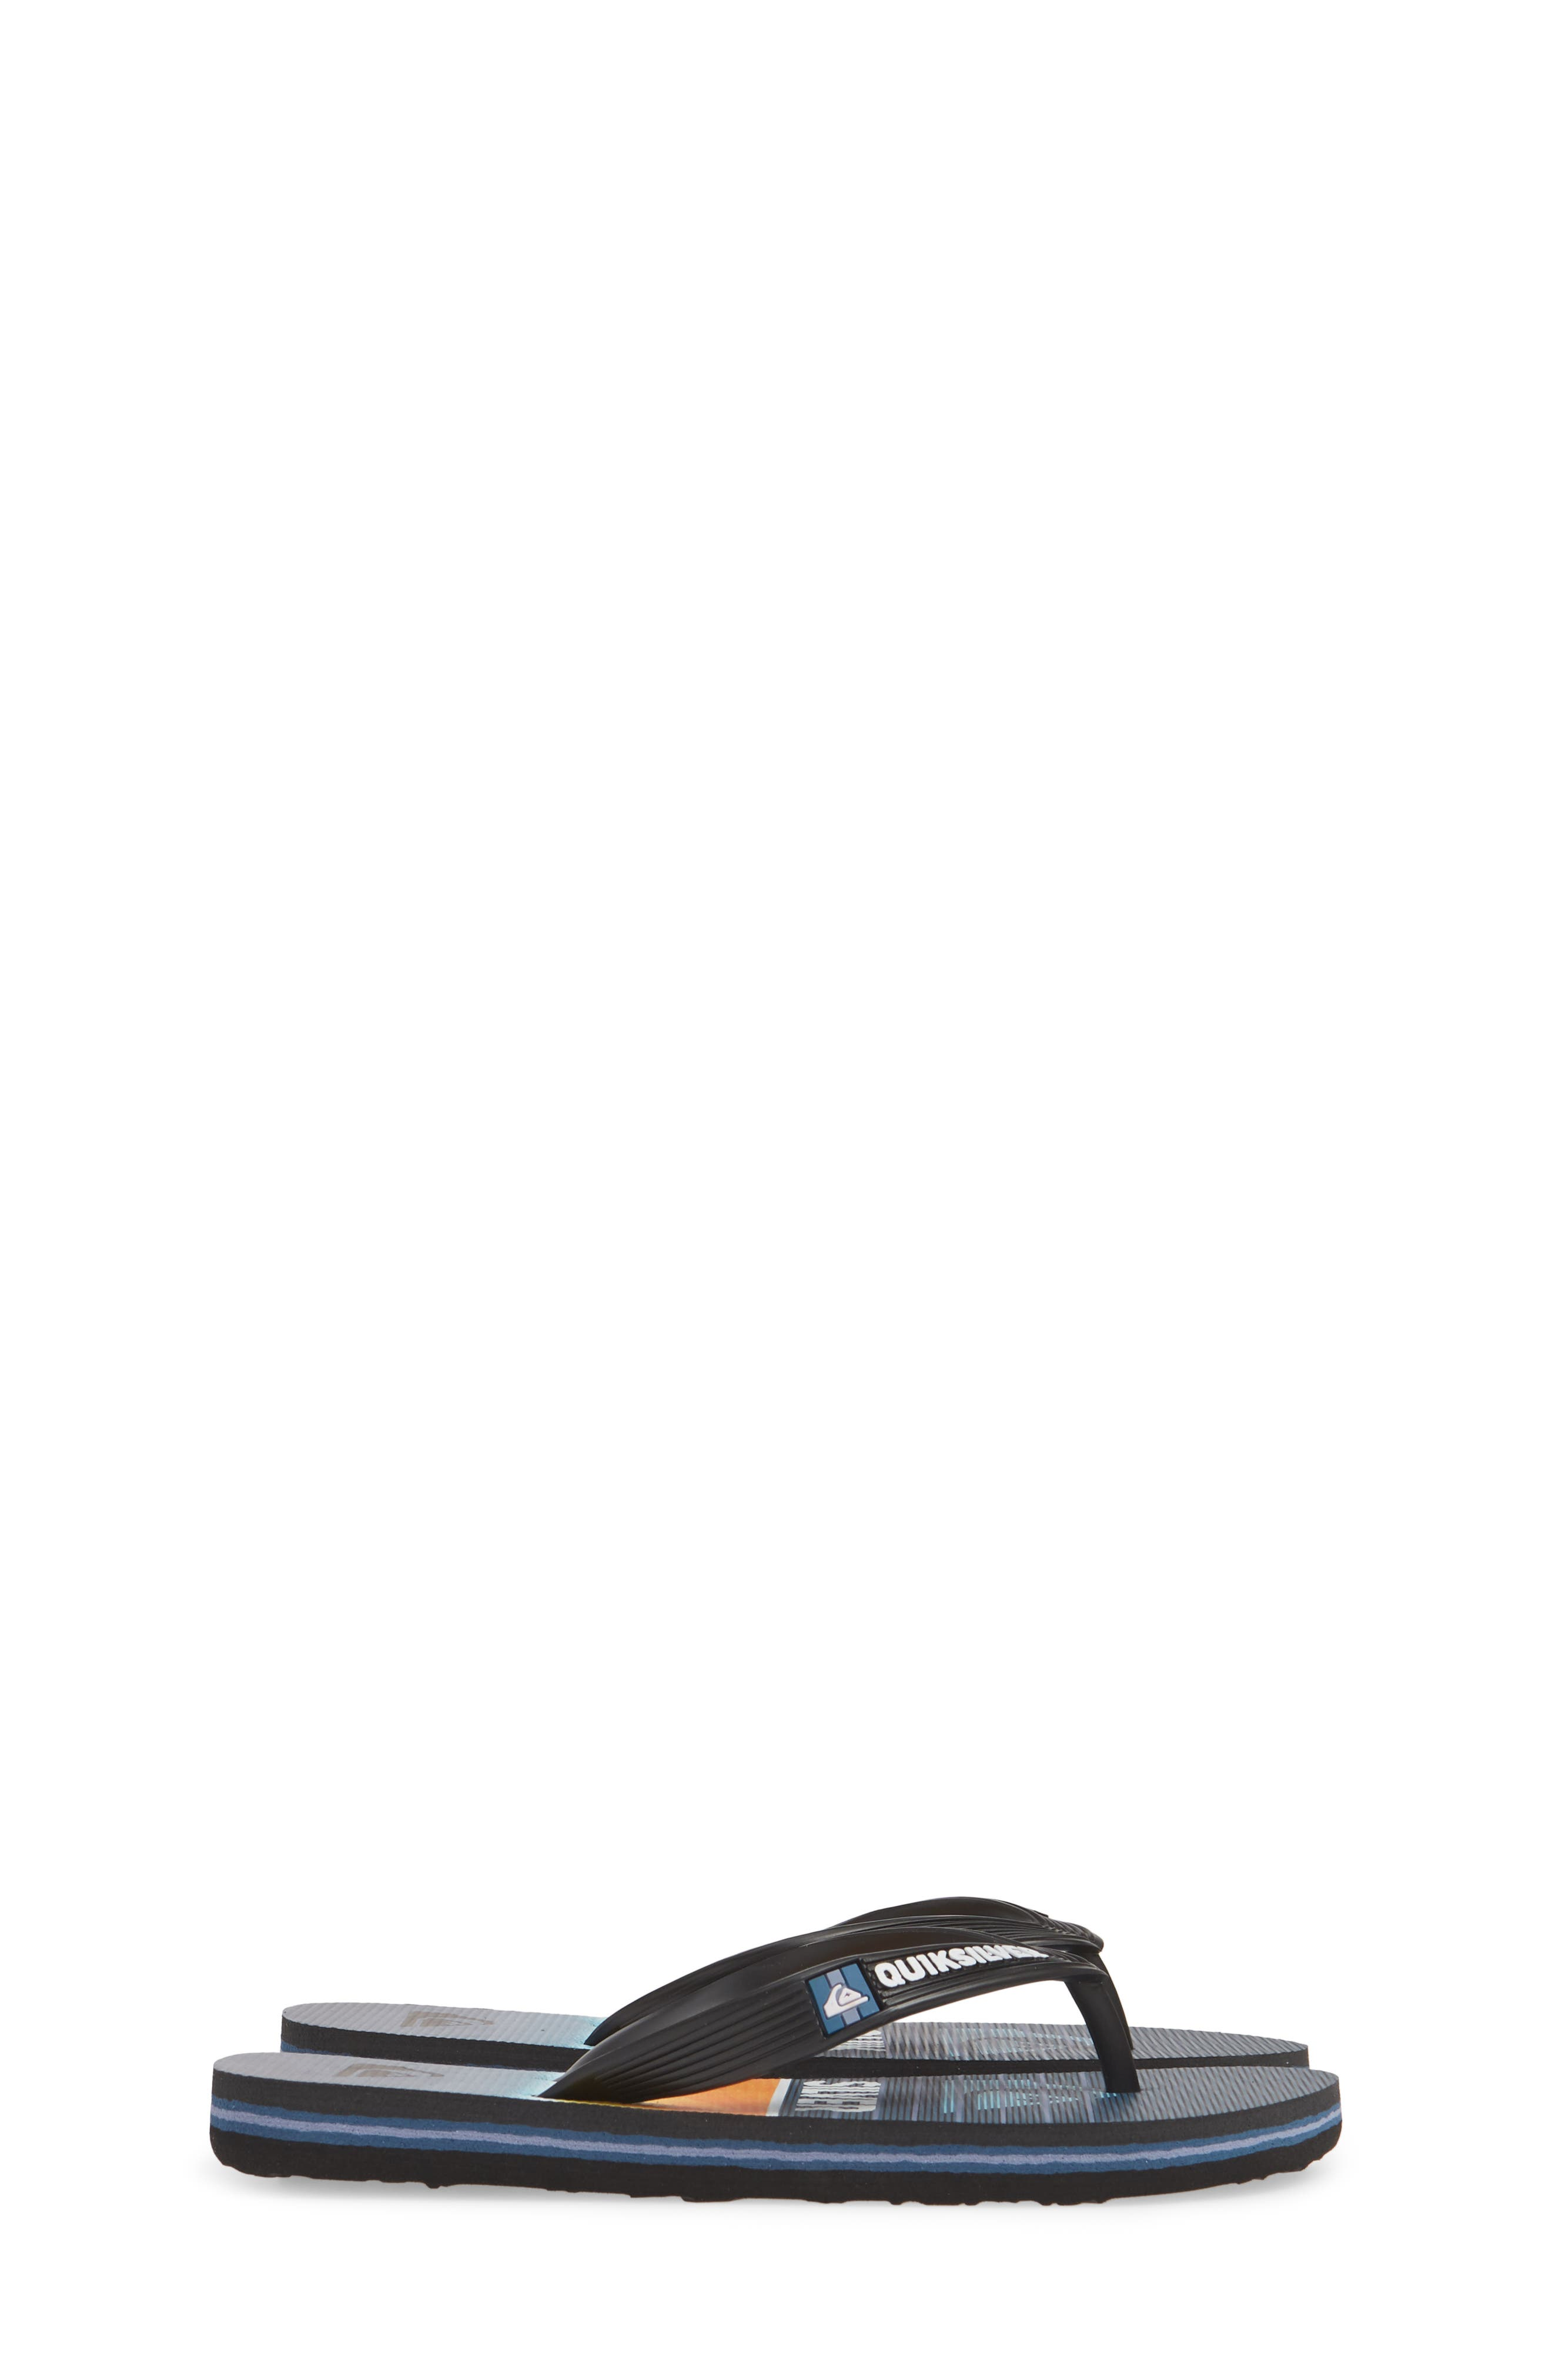 QUIKSILVER, Highline Slab Flip Flop, Alternate thumbnail 4, color, BLACK/ BLUE/ BLUE